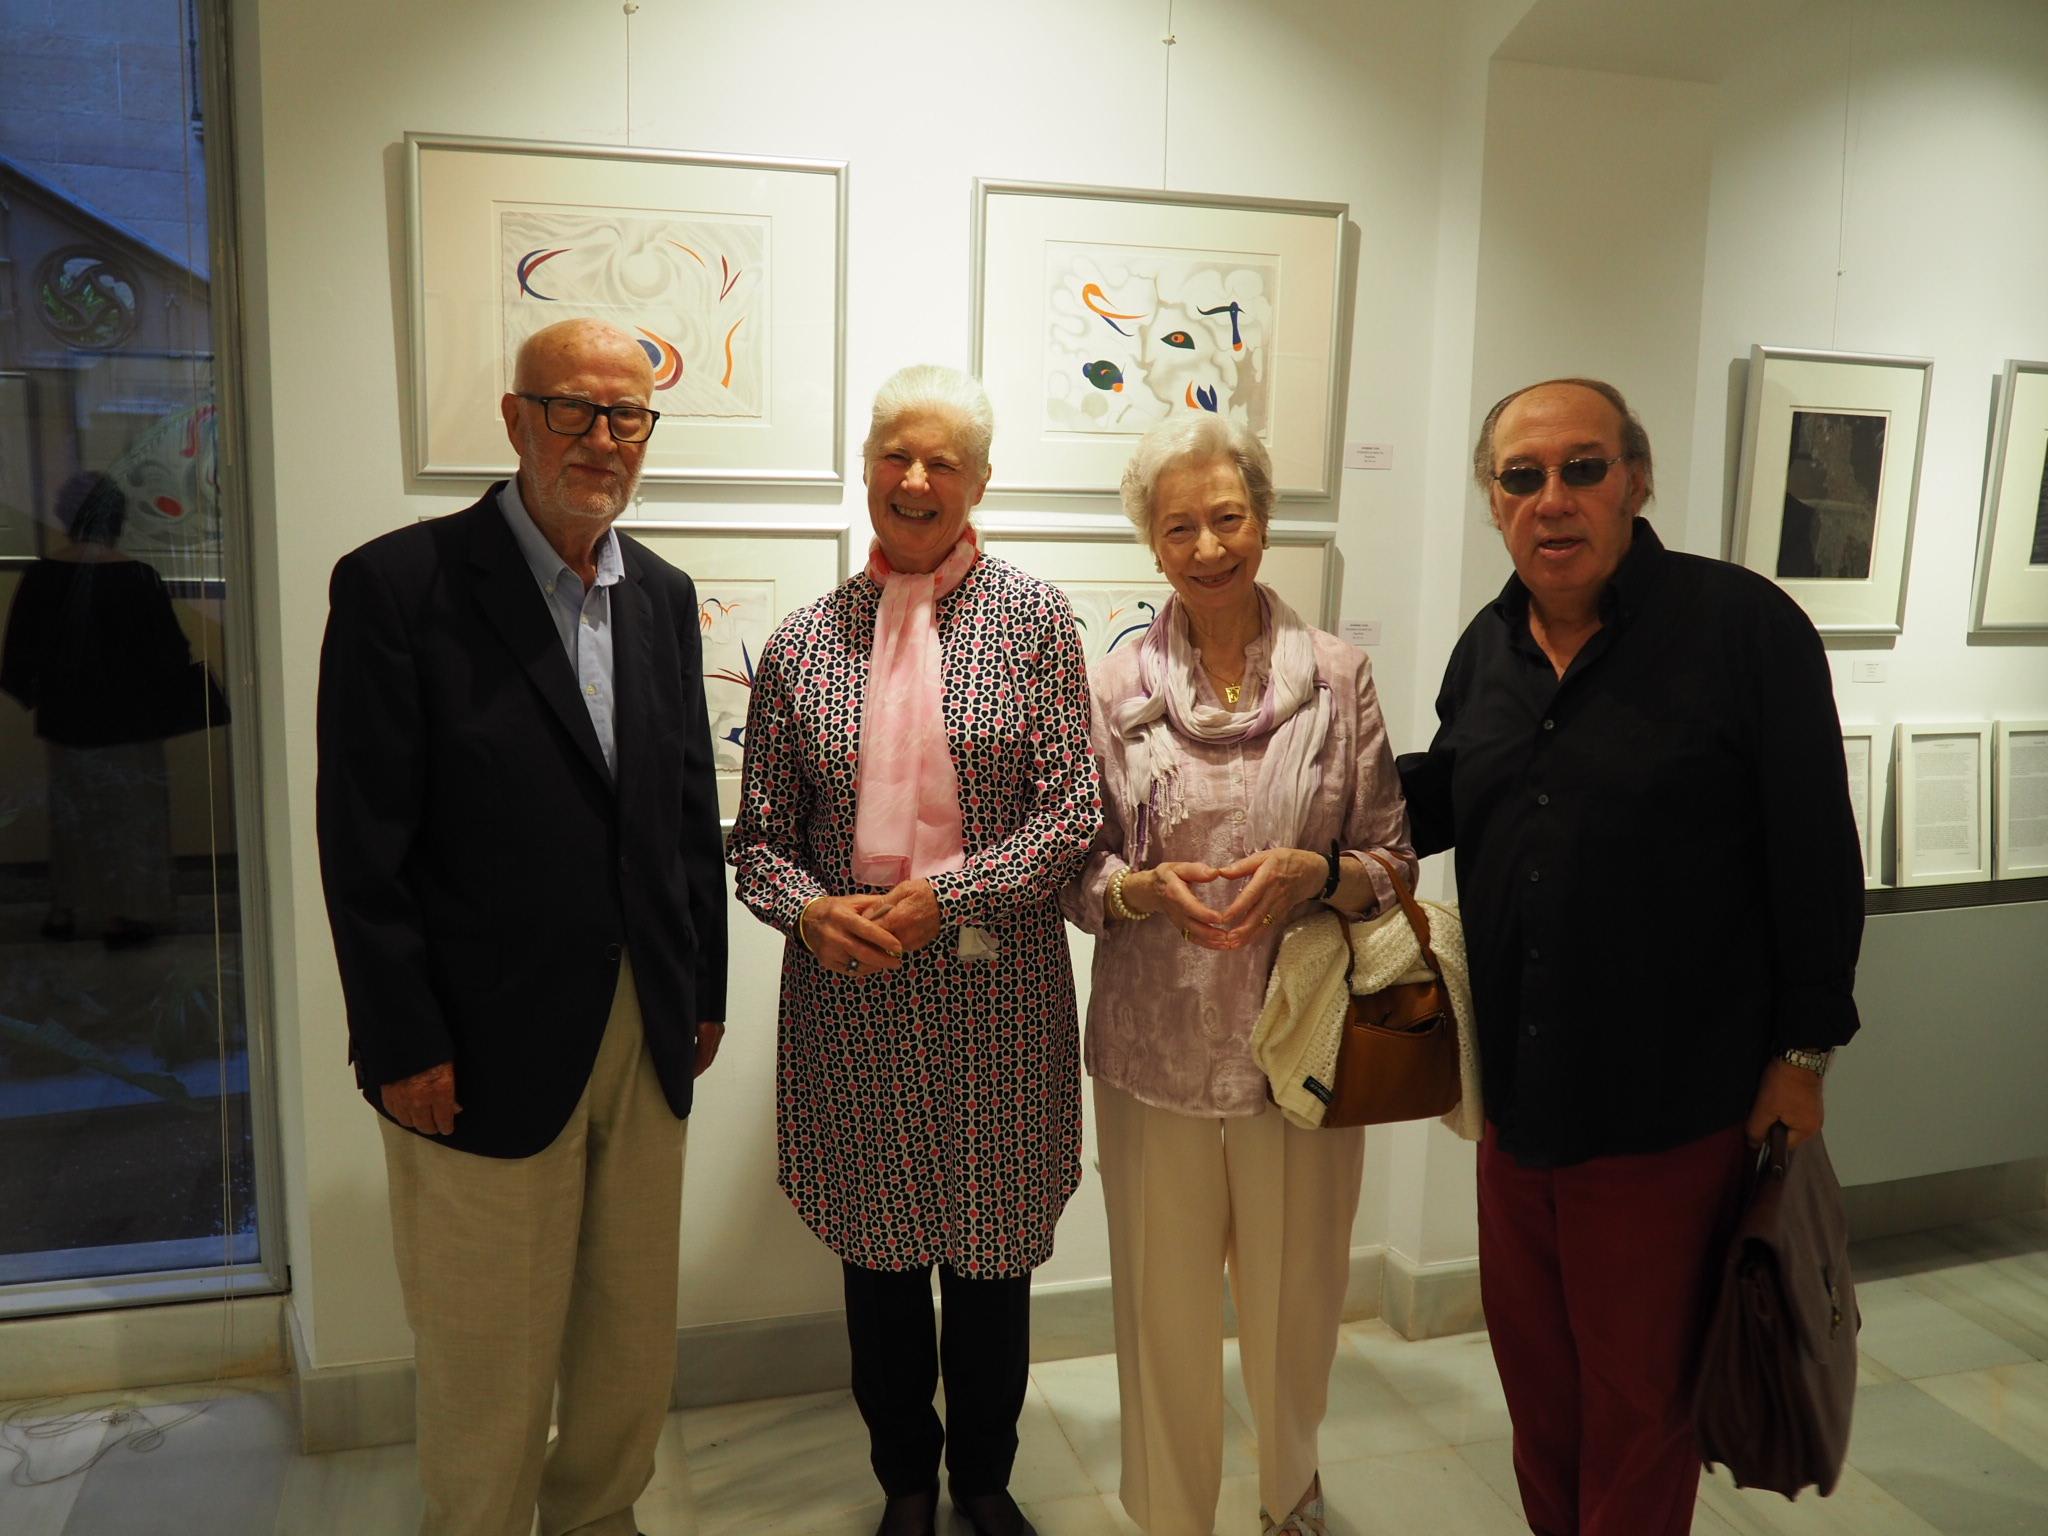 l to r, A Barceló, family member, artist Mari Vich, Jeannine Cook and art dealer Ricardo Lloret